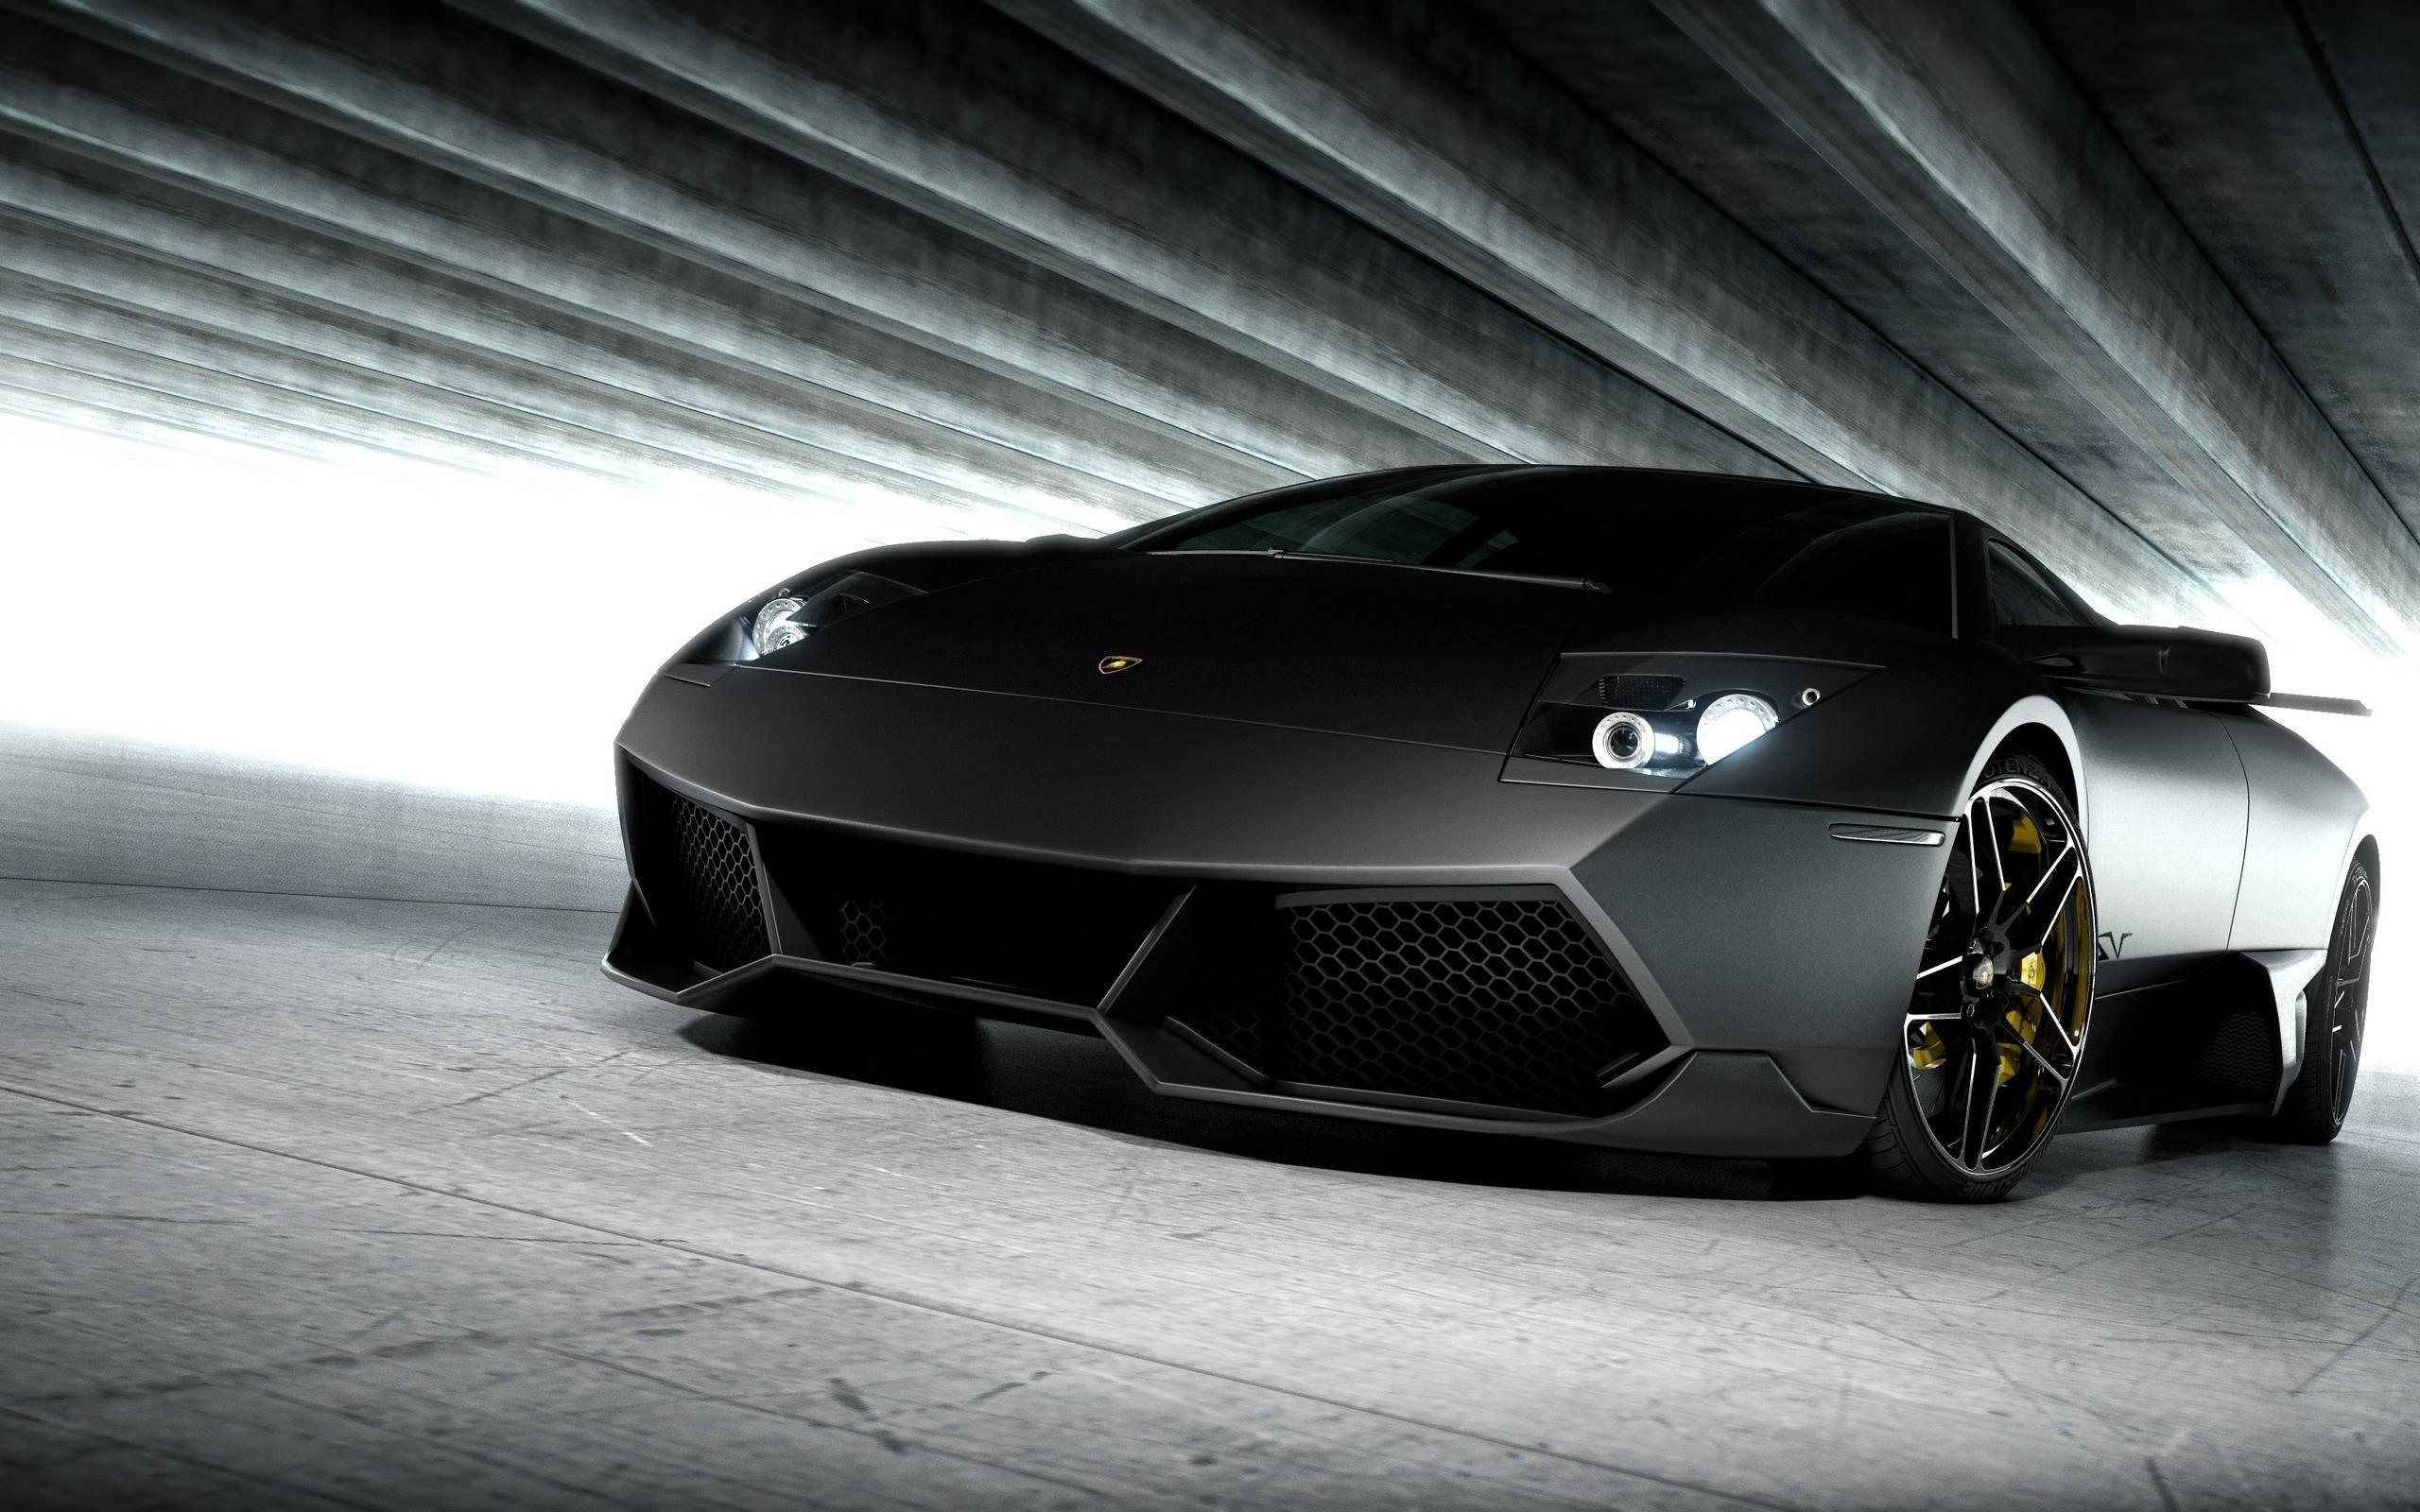 Images of Black Lamborghini Song - #rock-cafe